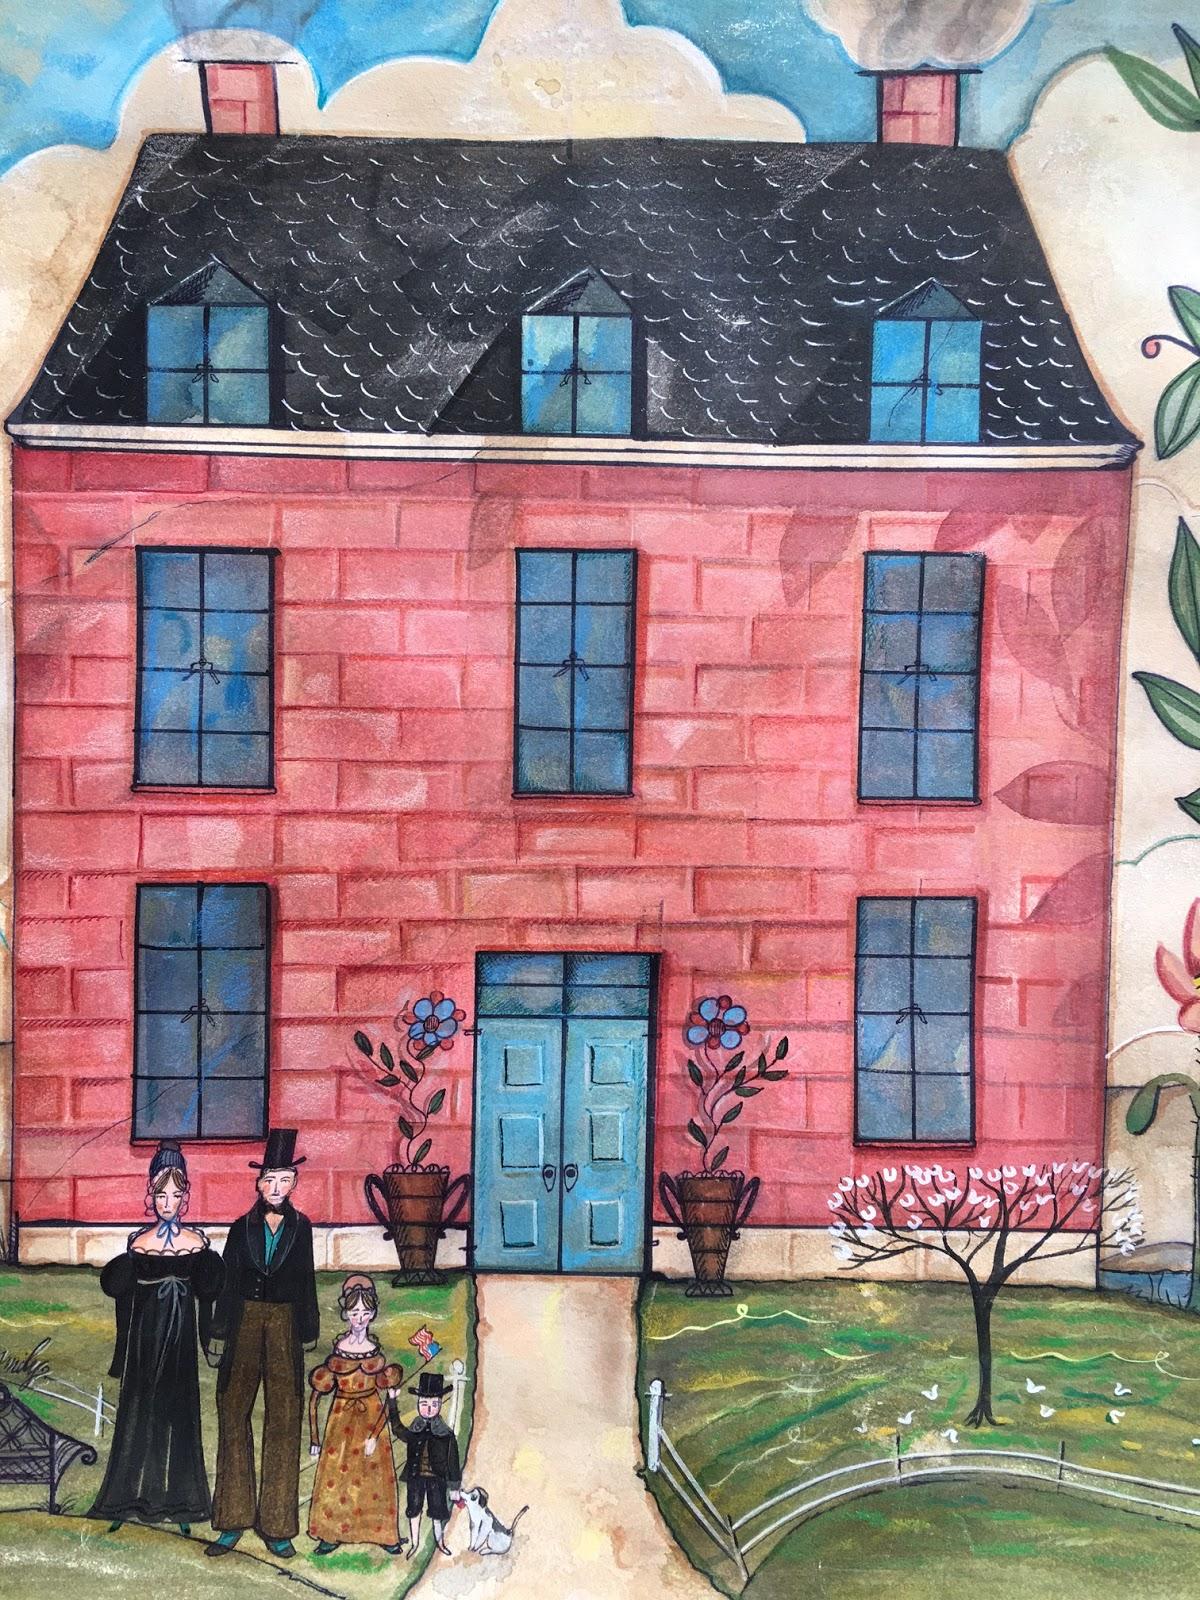 Kolene Spicher: Kolene Spicher Original Landscape painting, Part 2